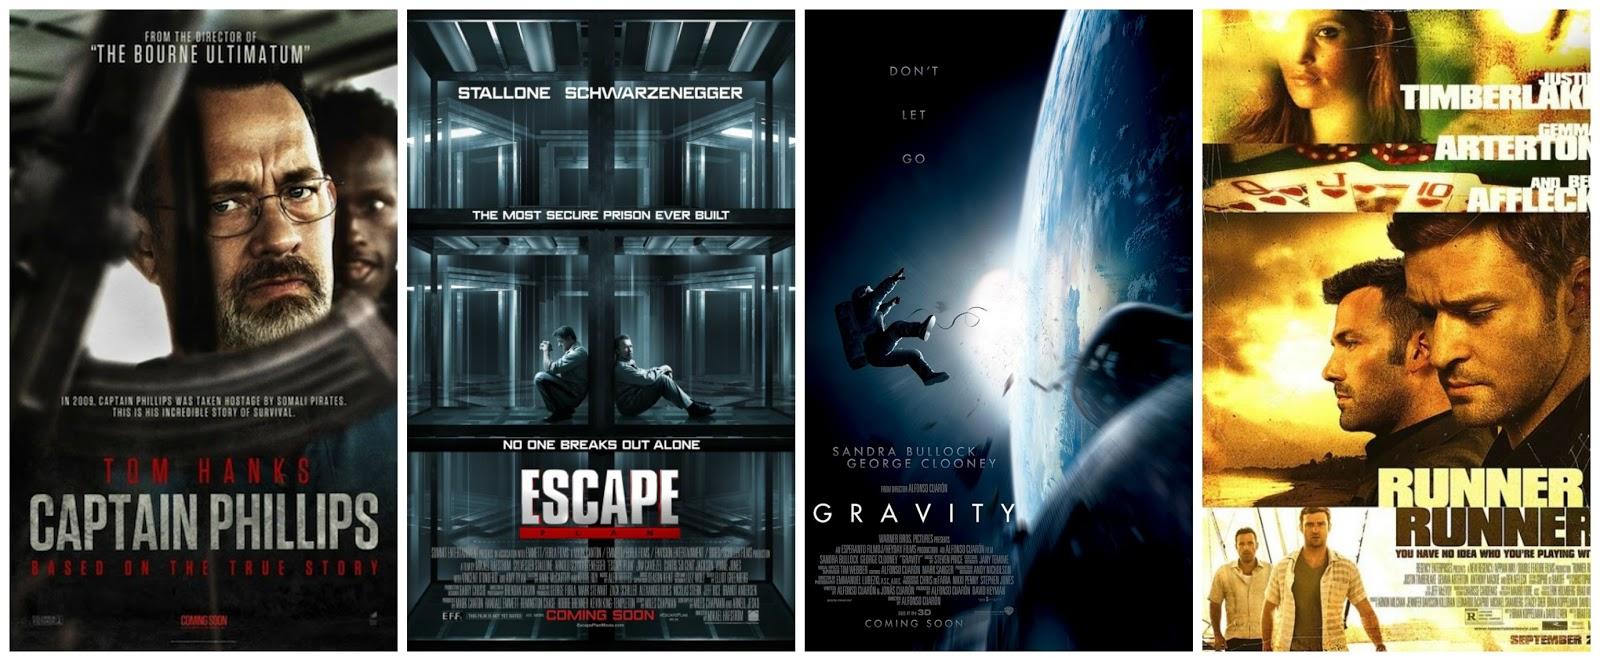 October movie previews